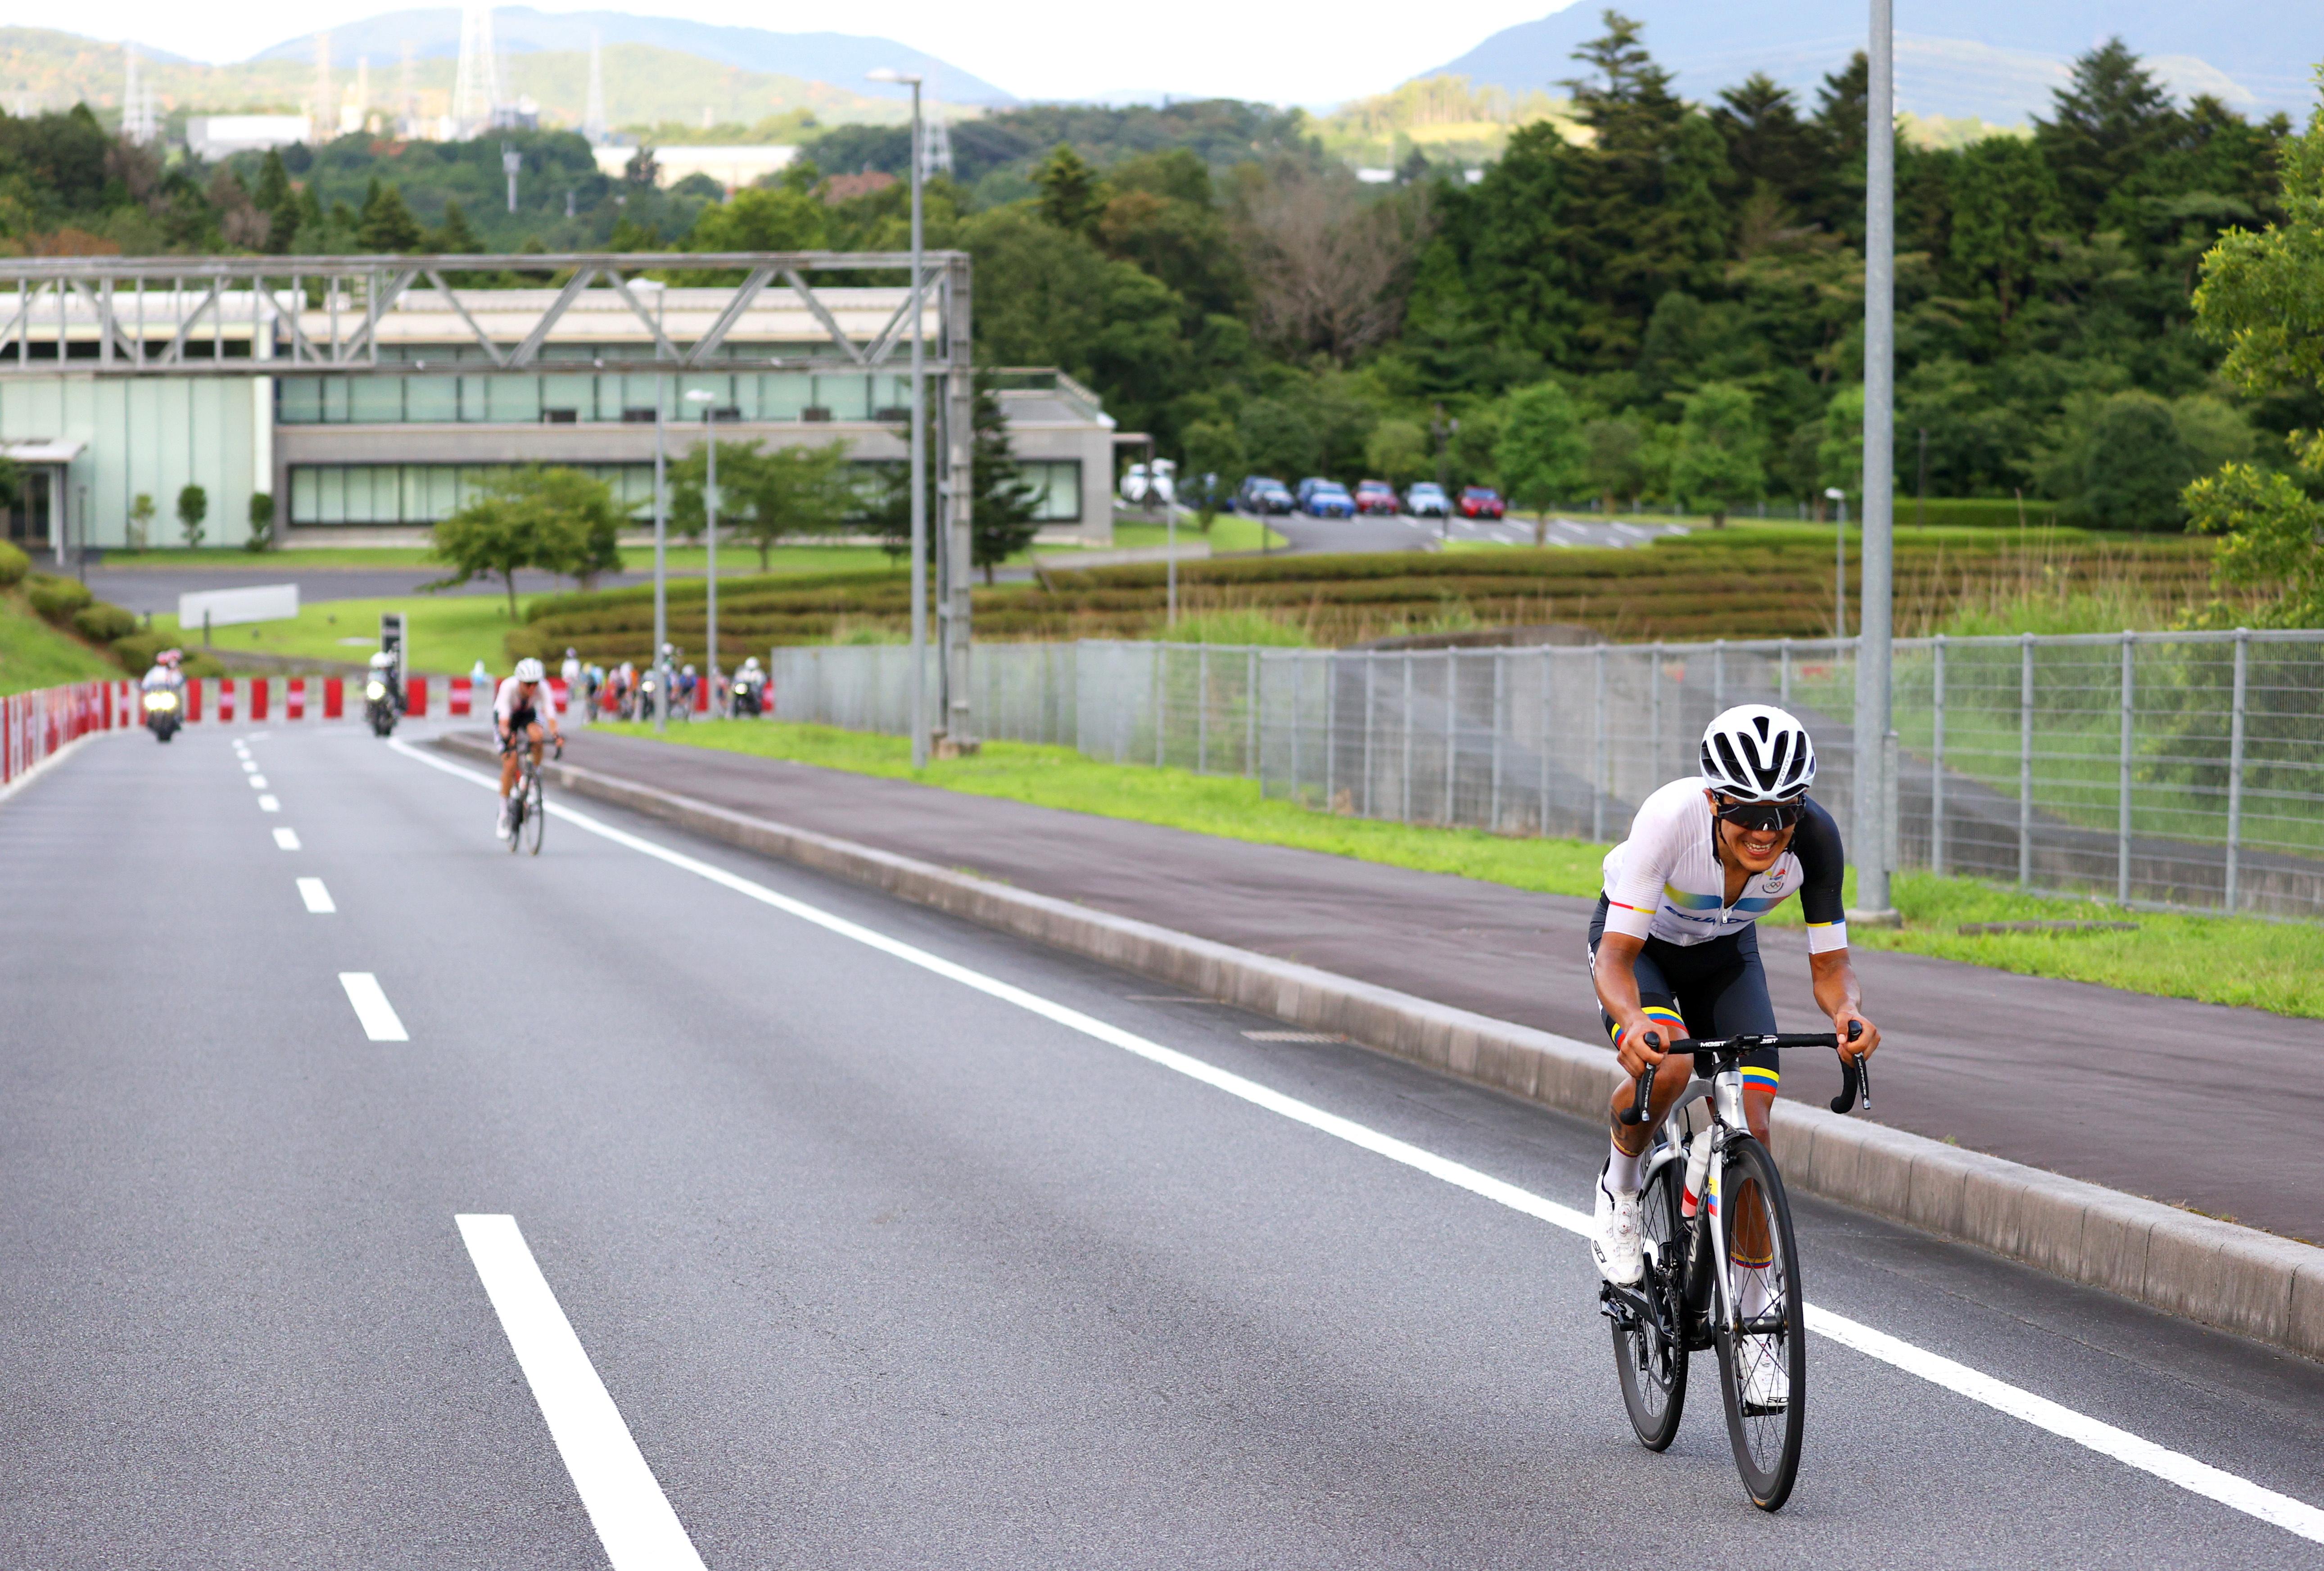 Tokyo 2020 Olympics - Cycling - Road - Men's Road Race - Final - Tokyo to Fuji International Speedway, Japan - July 24, 2021. Richard Carapaz of Ecuador in action during the Men's Road Race.  Pool via Reuters/Tim de Waele